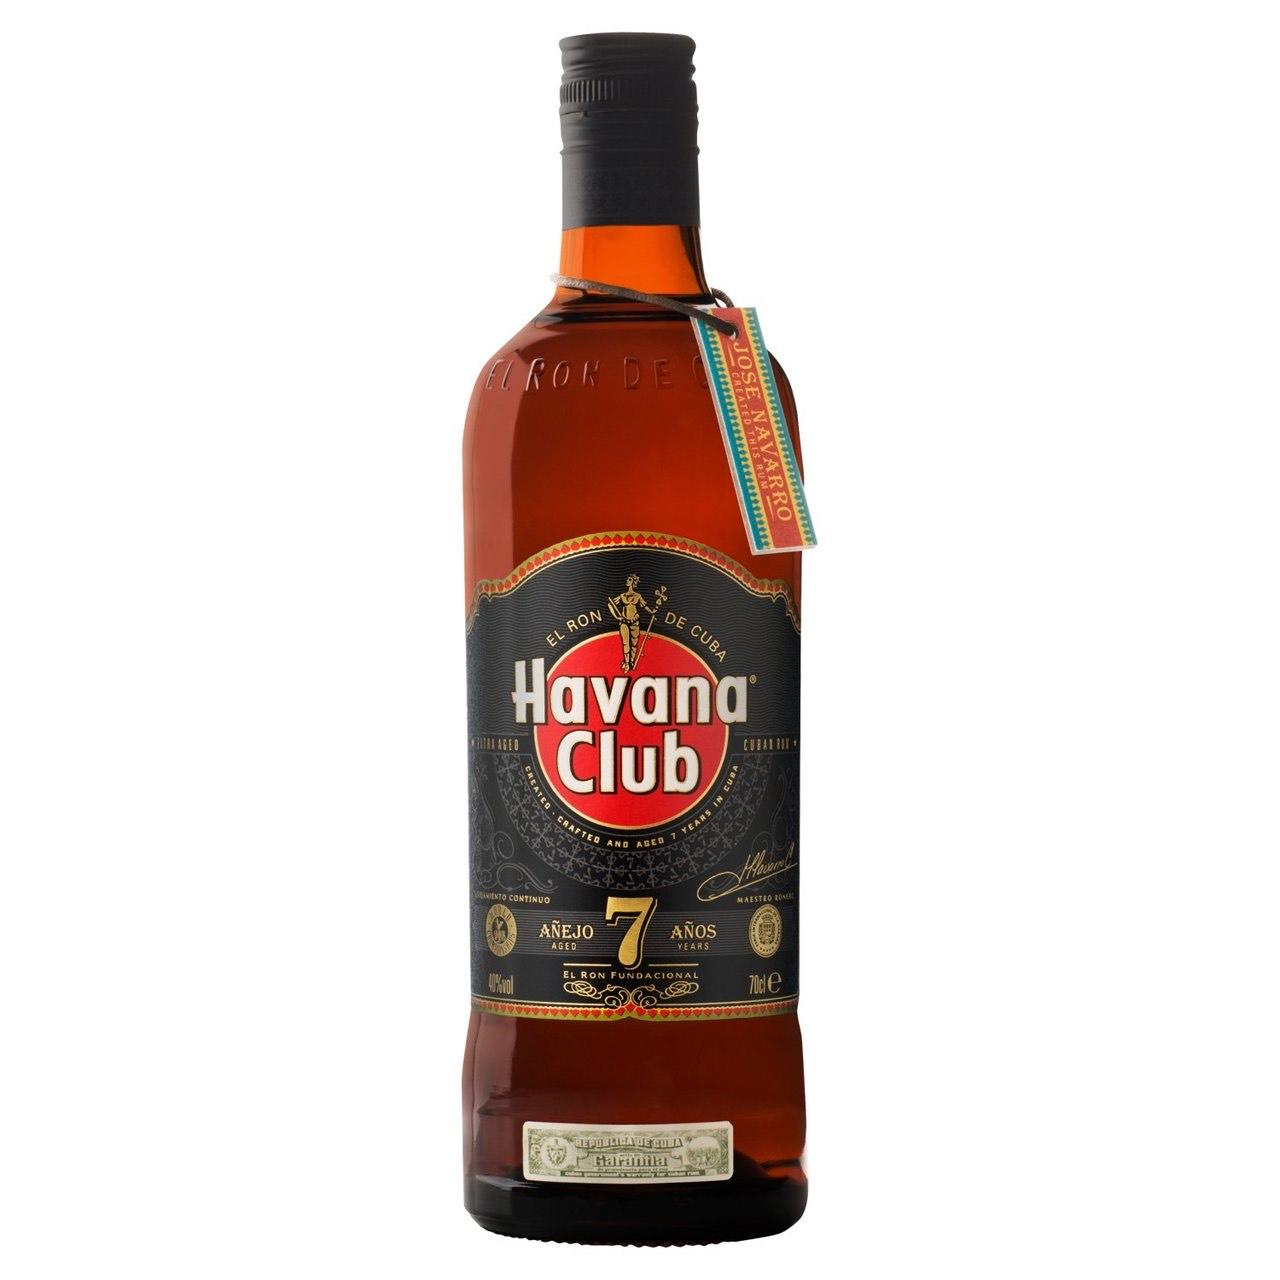 Havana Club 7 Year Old Cuban Rum (70cl) @ Morrison's - £20